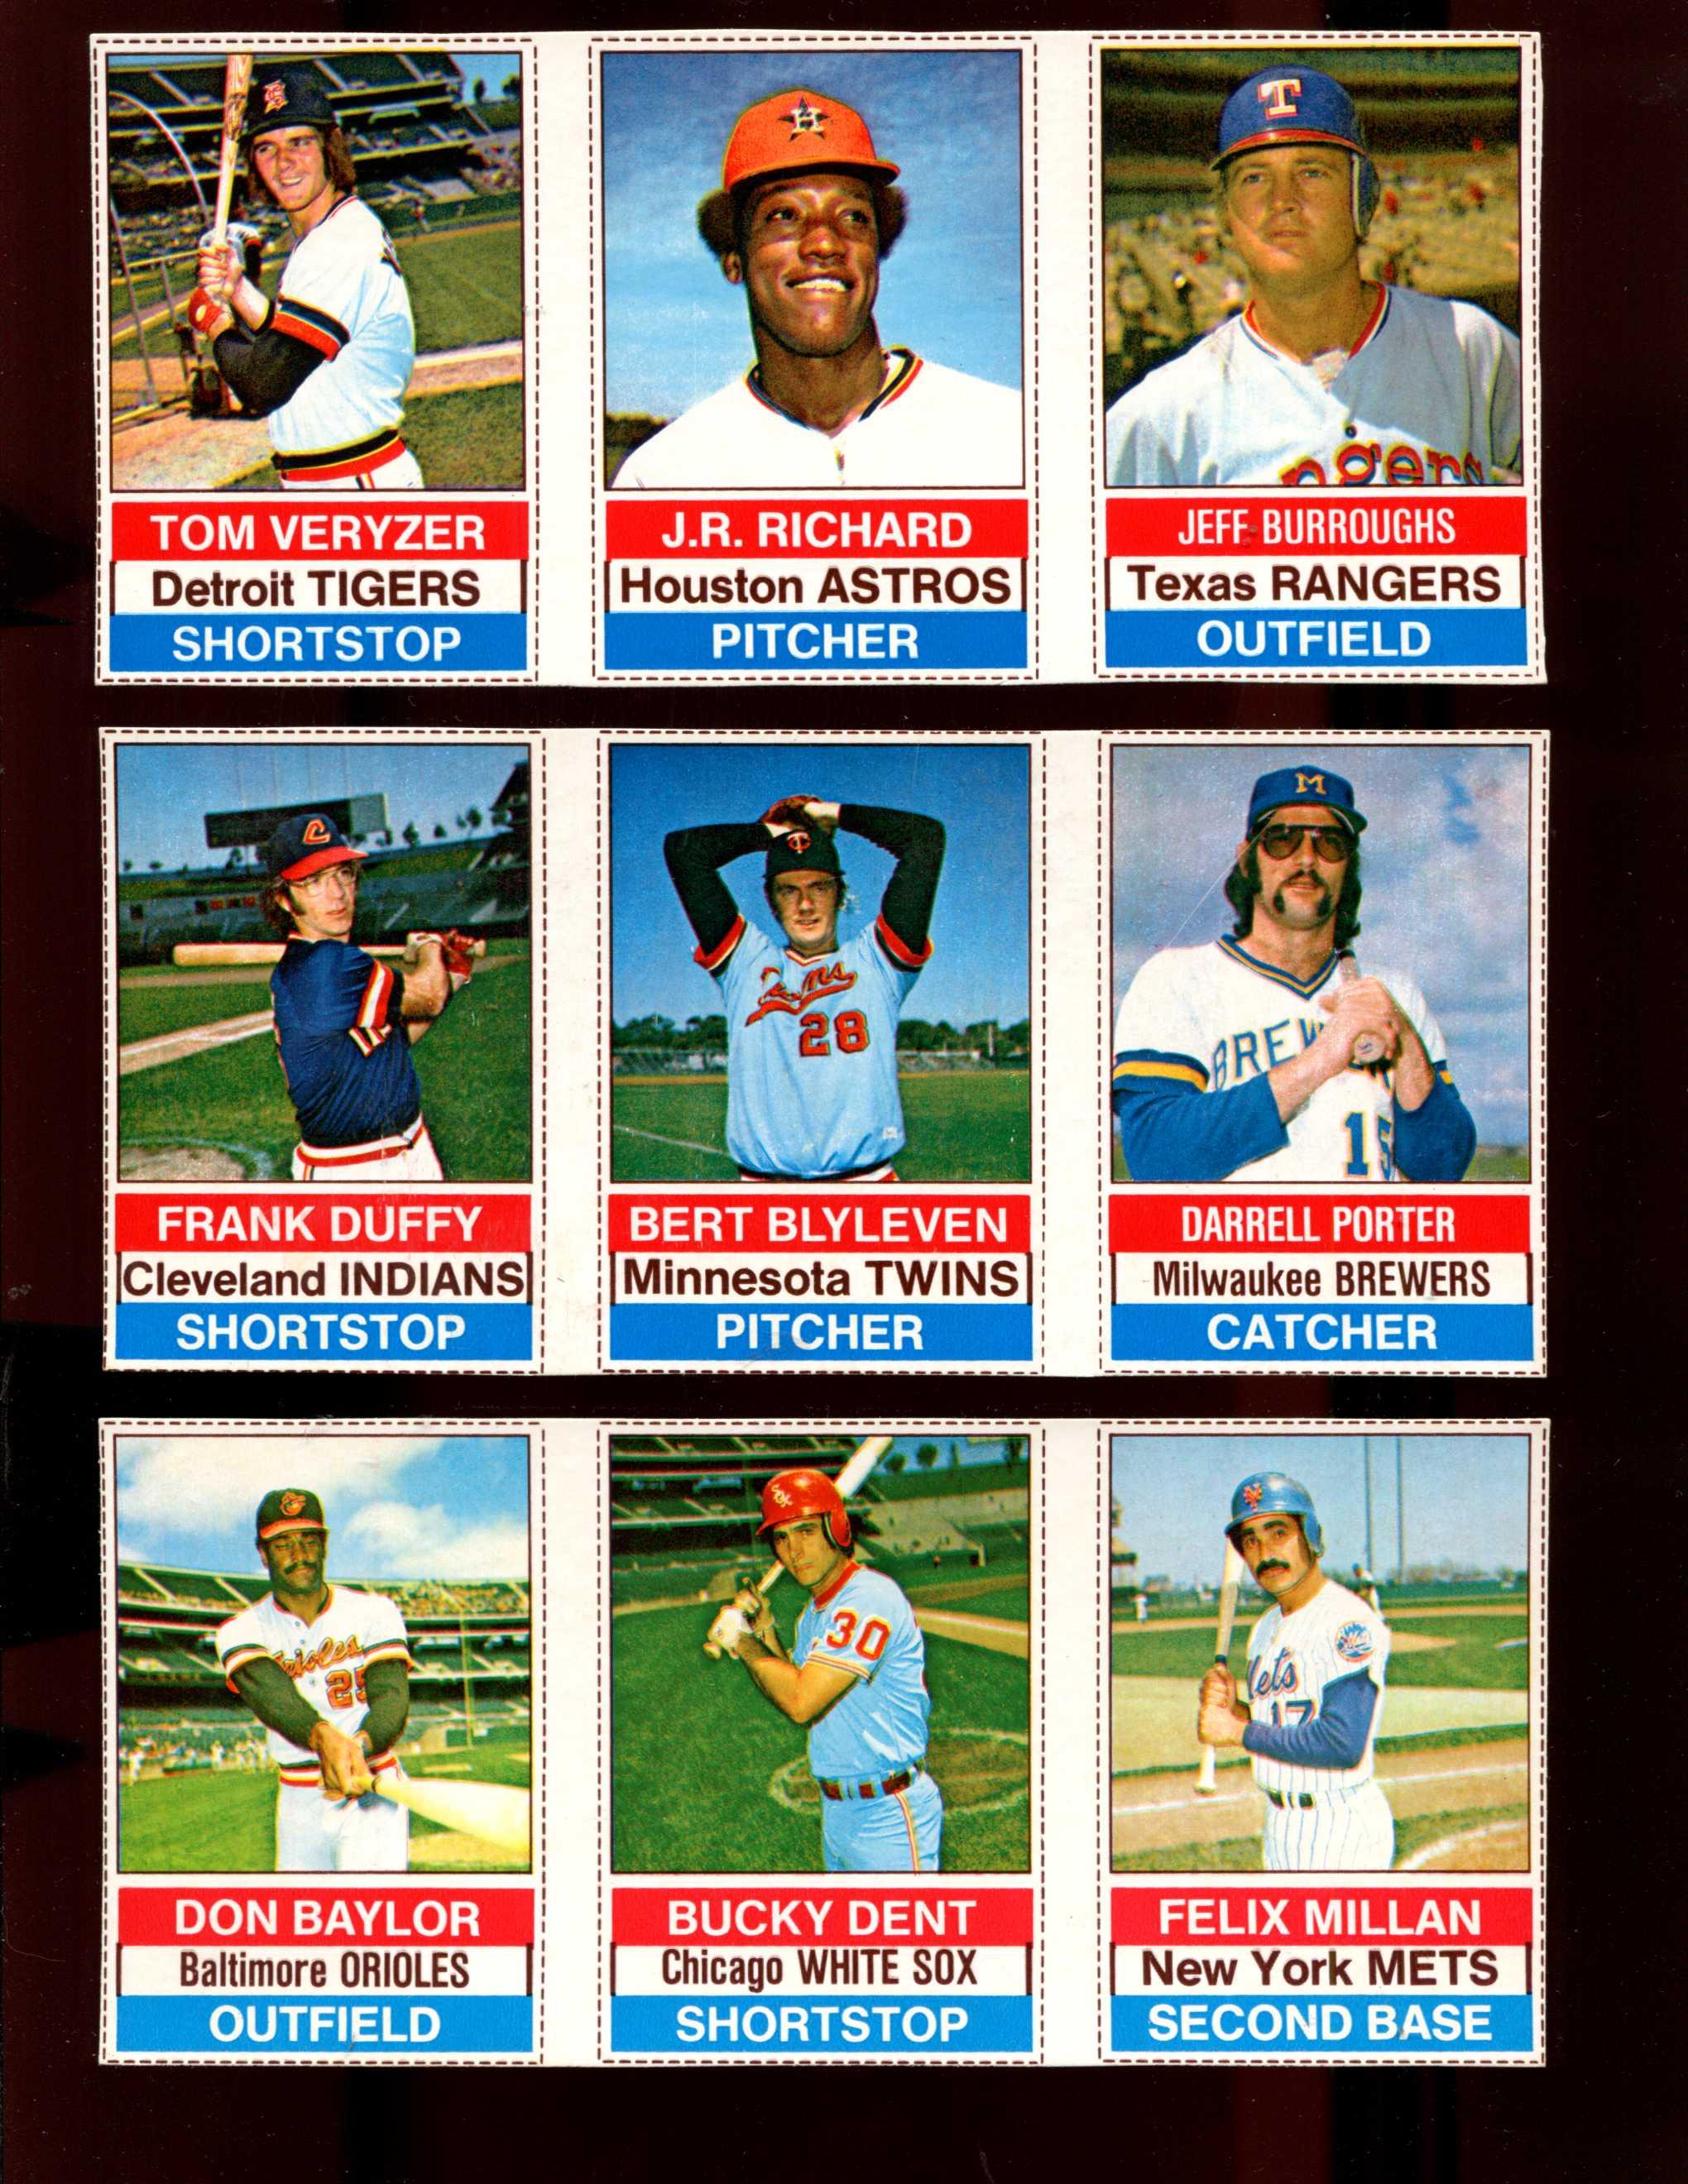 1976 Hostess Baseball Cards Set Checklist Prices Values